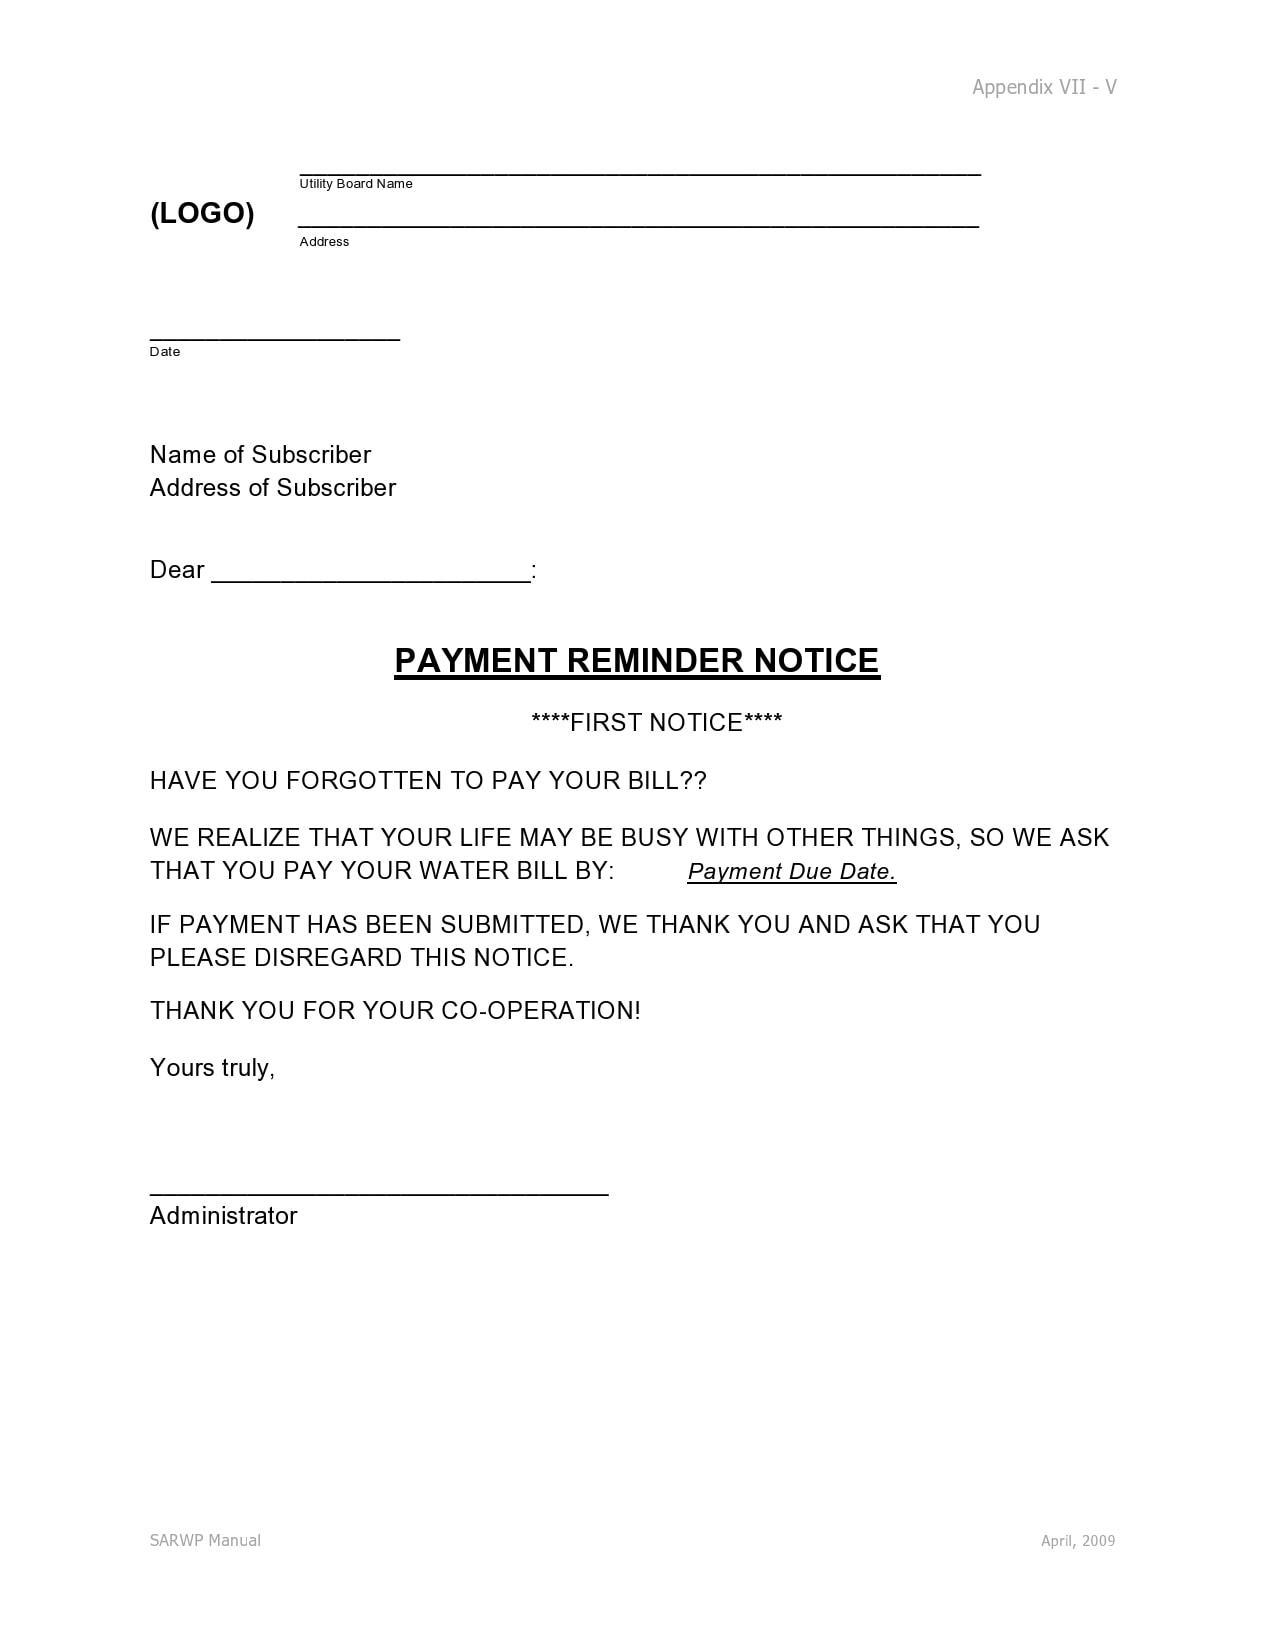 payment reminder 11